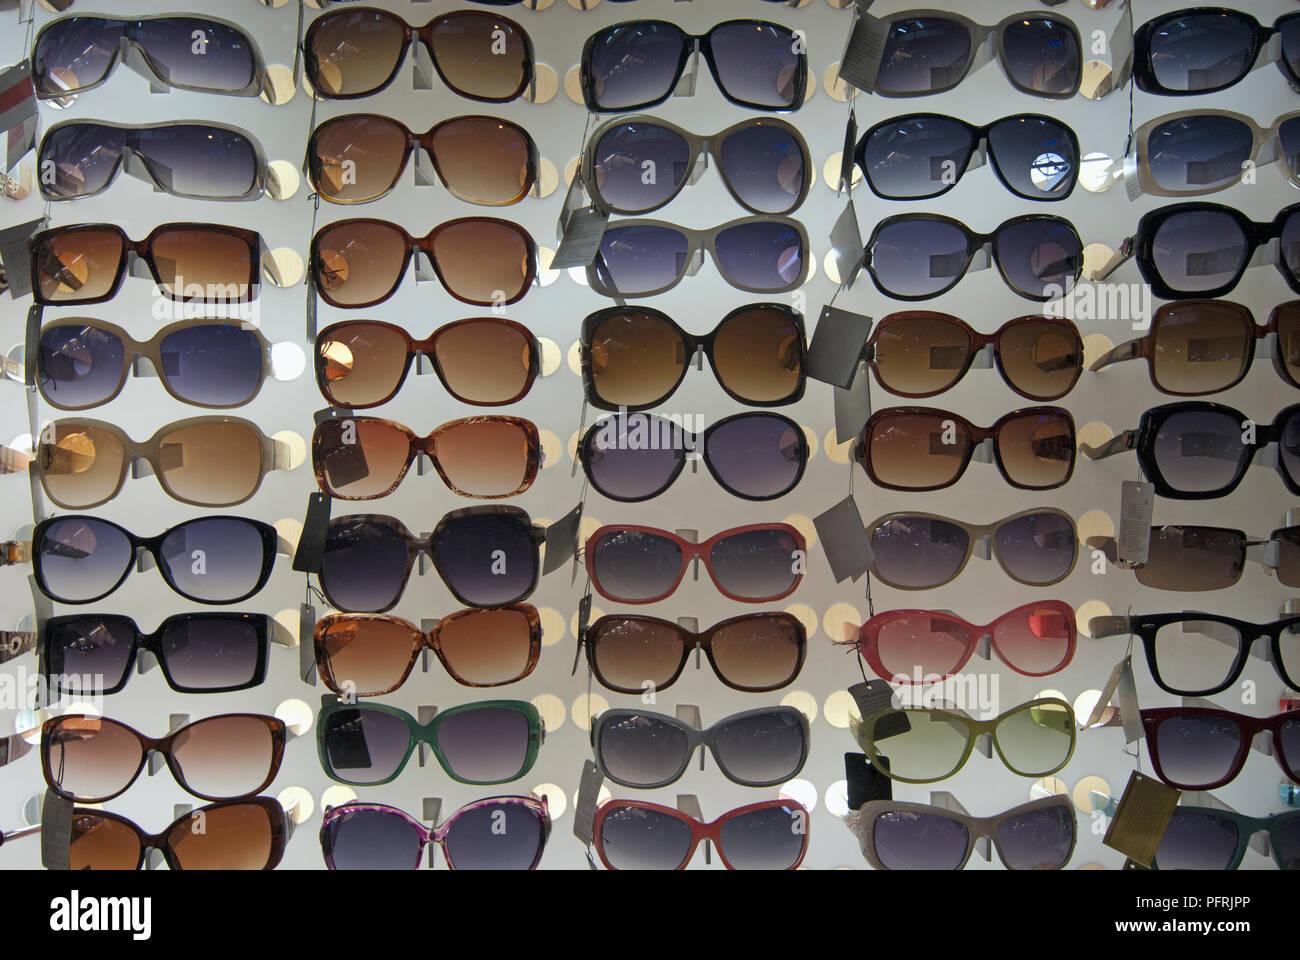 22cb5ef4a8 La Thaïlande, Phuket, Patong Beach, lunettes à vendre à beachside stall